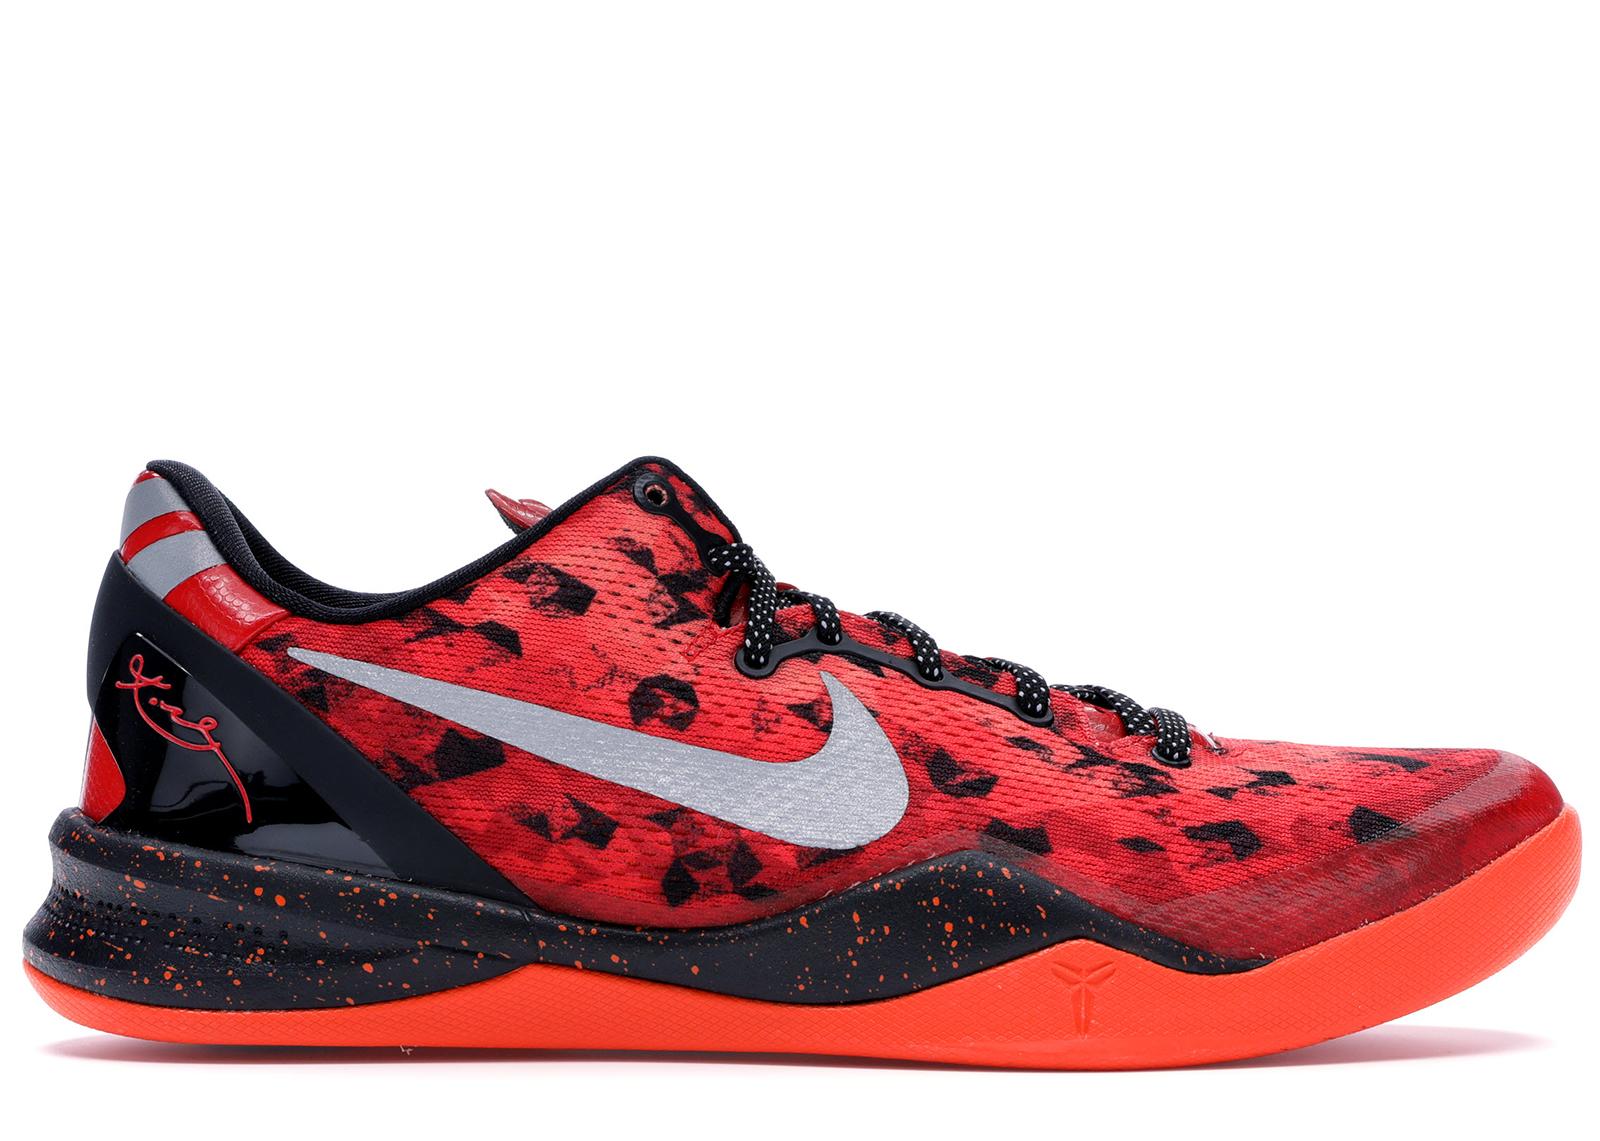 Nike Kobe 8 Challenge Red - 555035-600